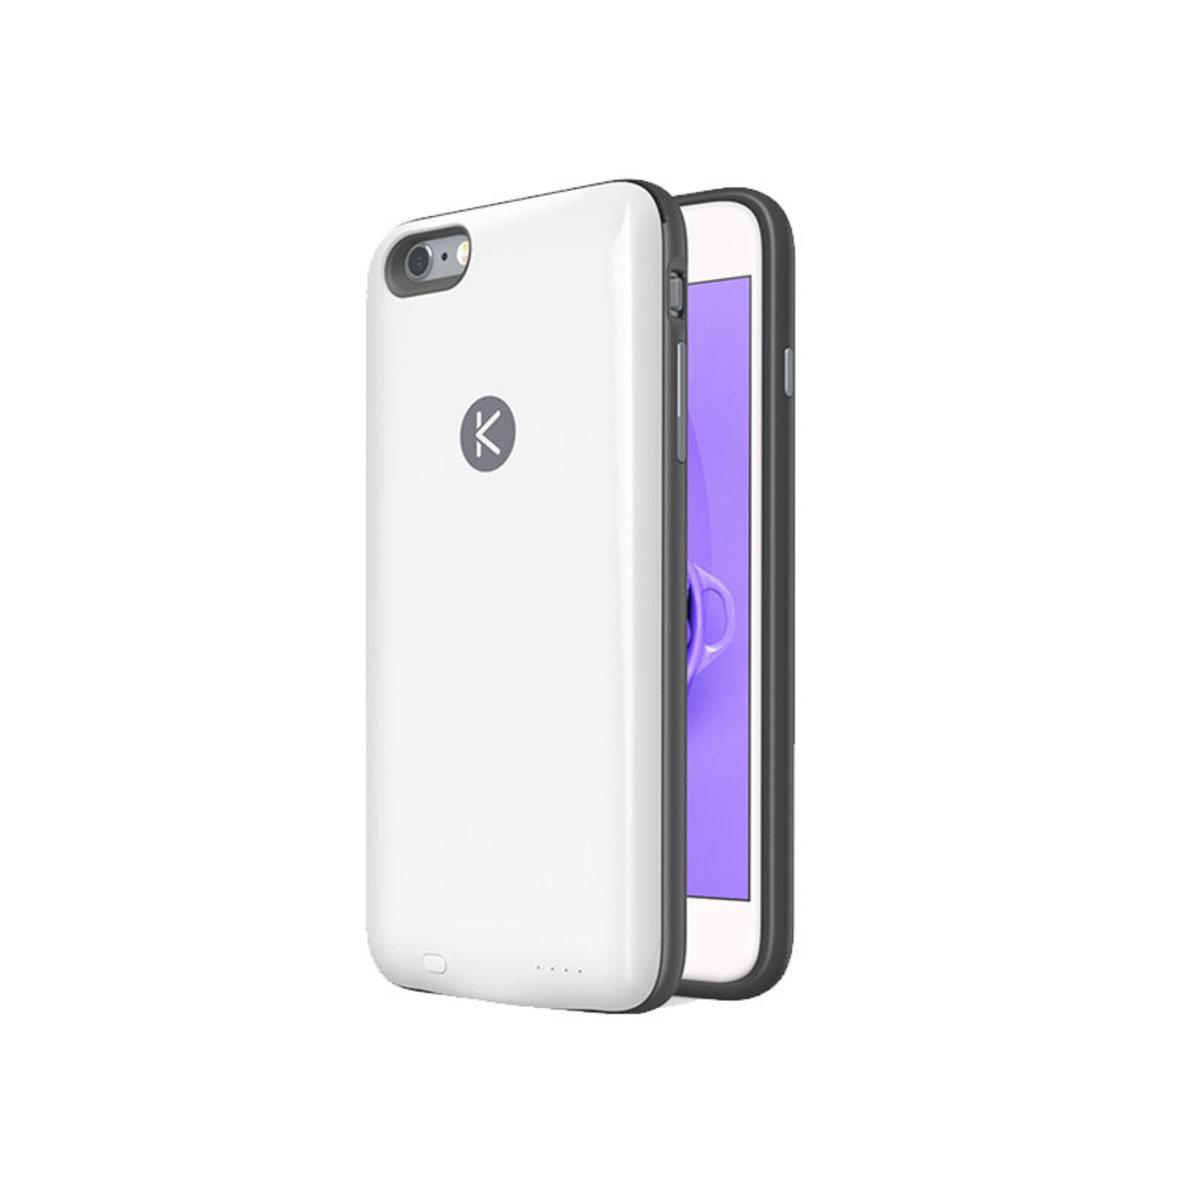 iPhone 6 Plus / 6S Plus專用機殼內置64GB連2400mAh充電池 黑色+白色 I6PBW64